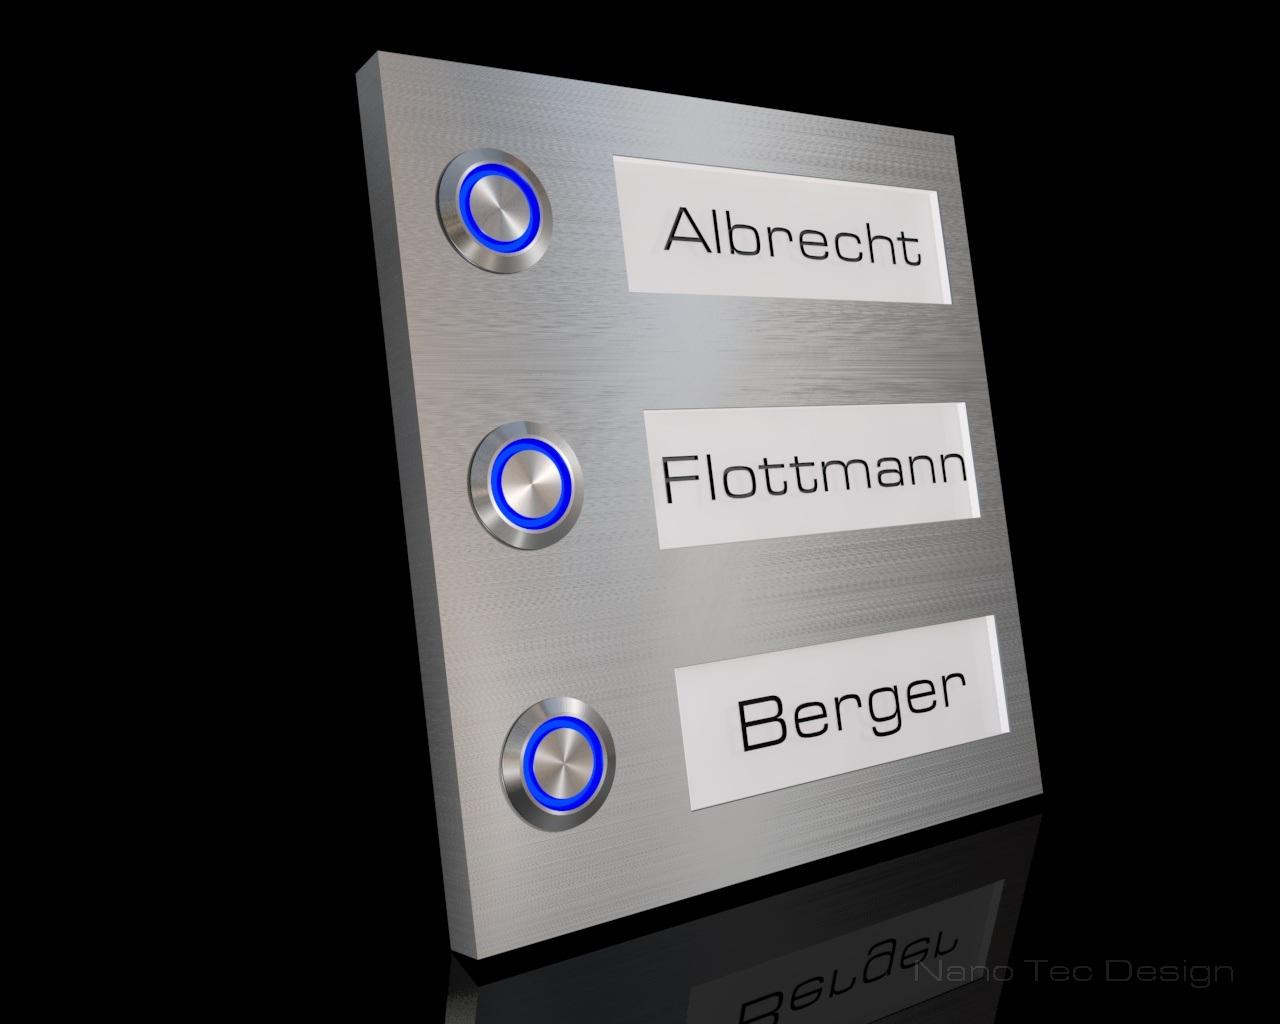 3 Familien Design Edelstahlklingel mit Led- Namesbeleuchtung zum austauschen